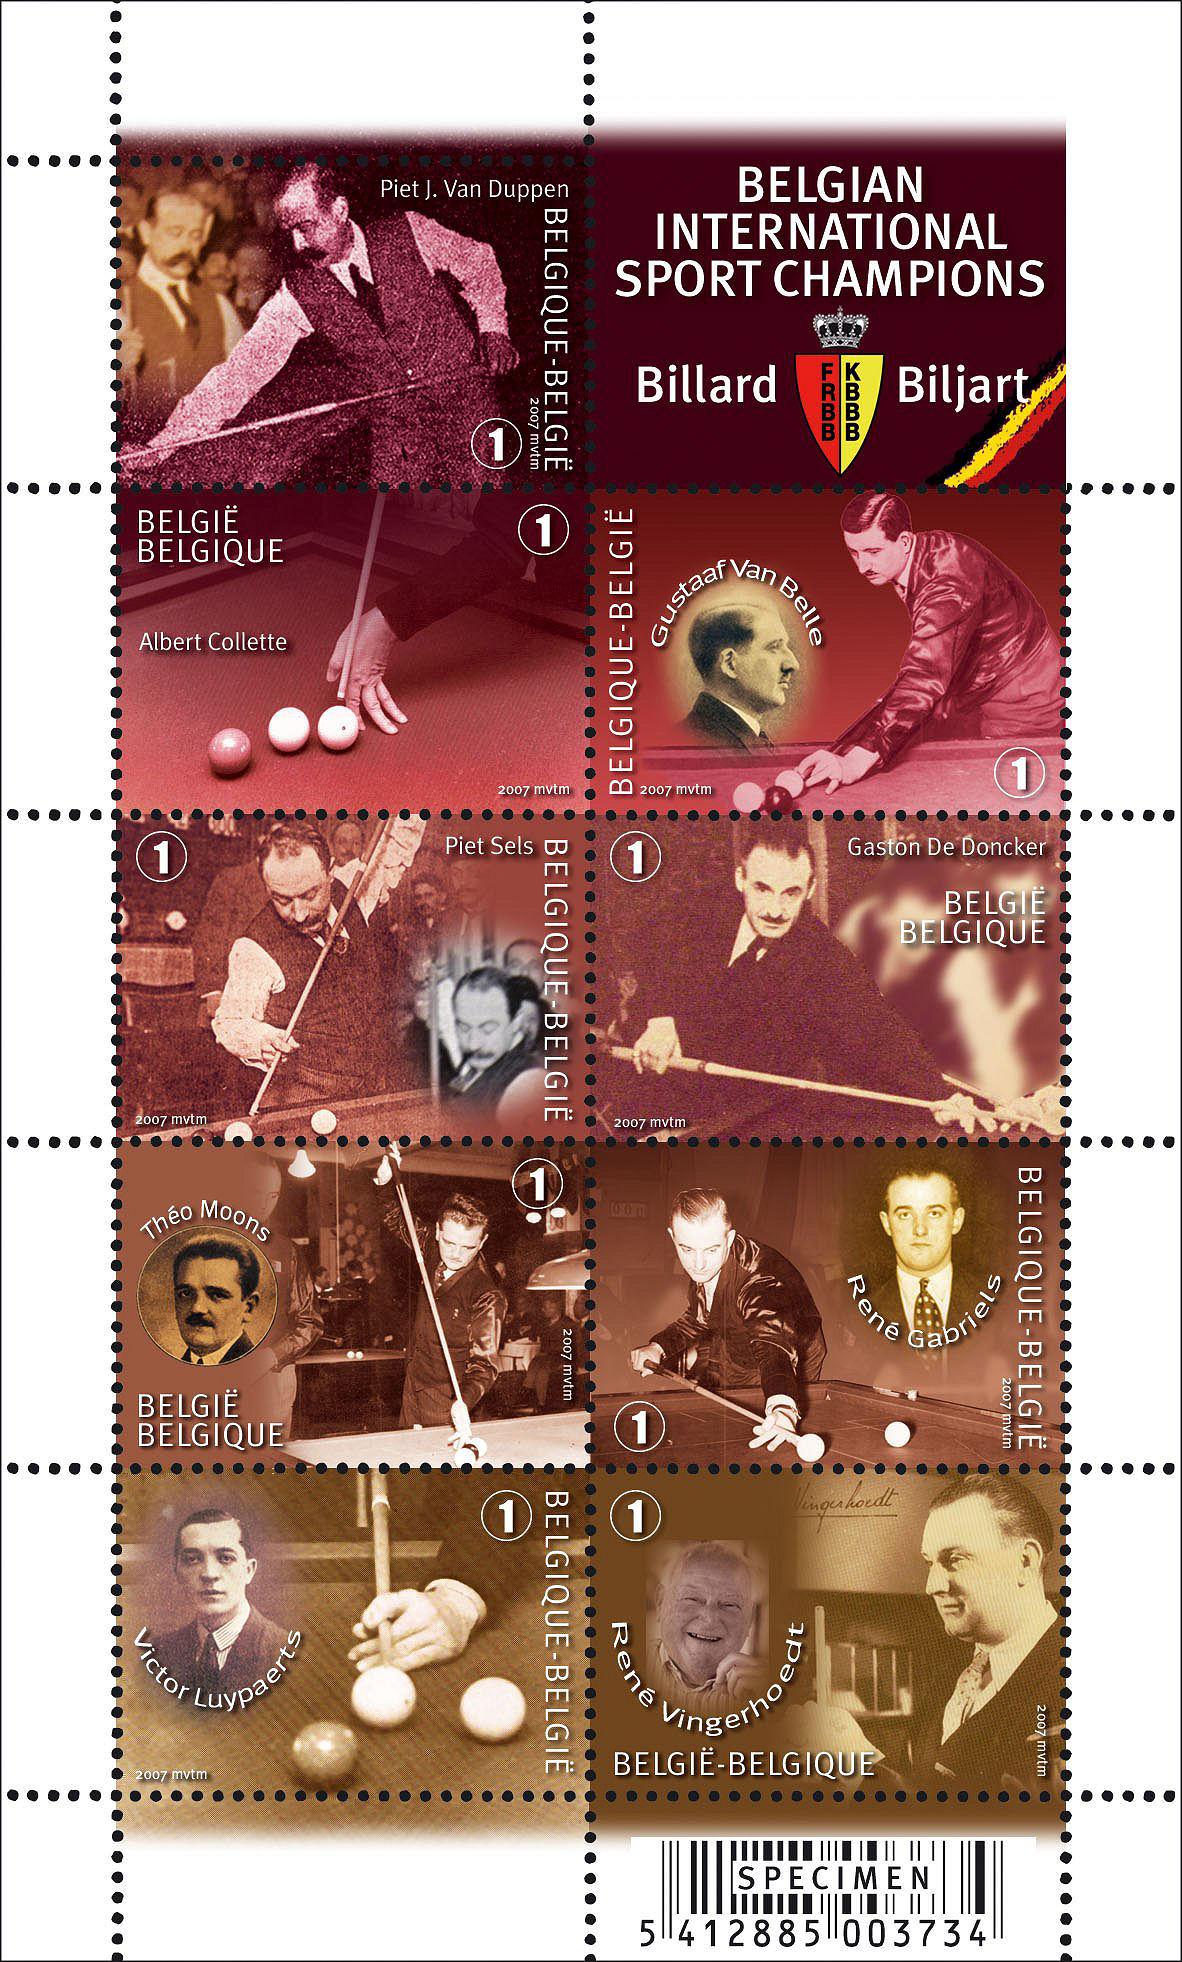 Belgische biljartpostzegels